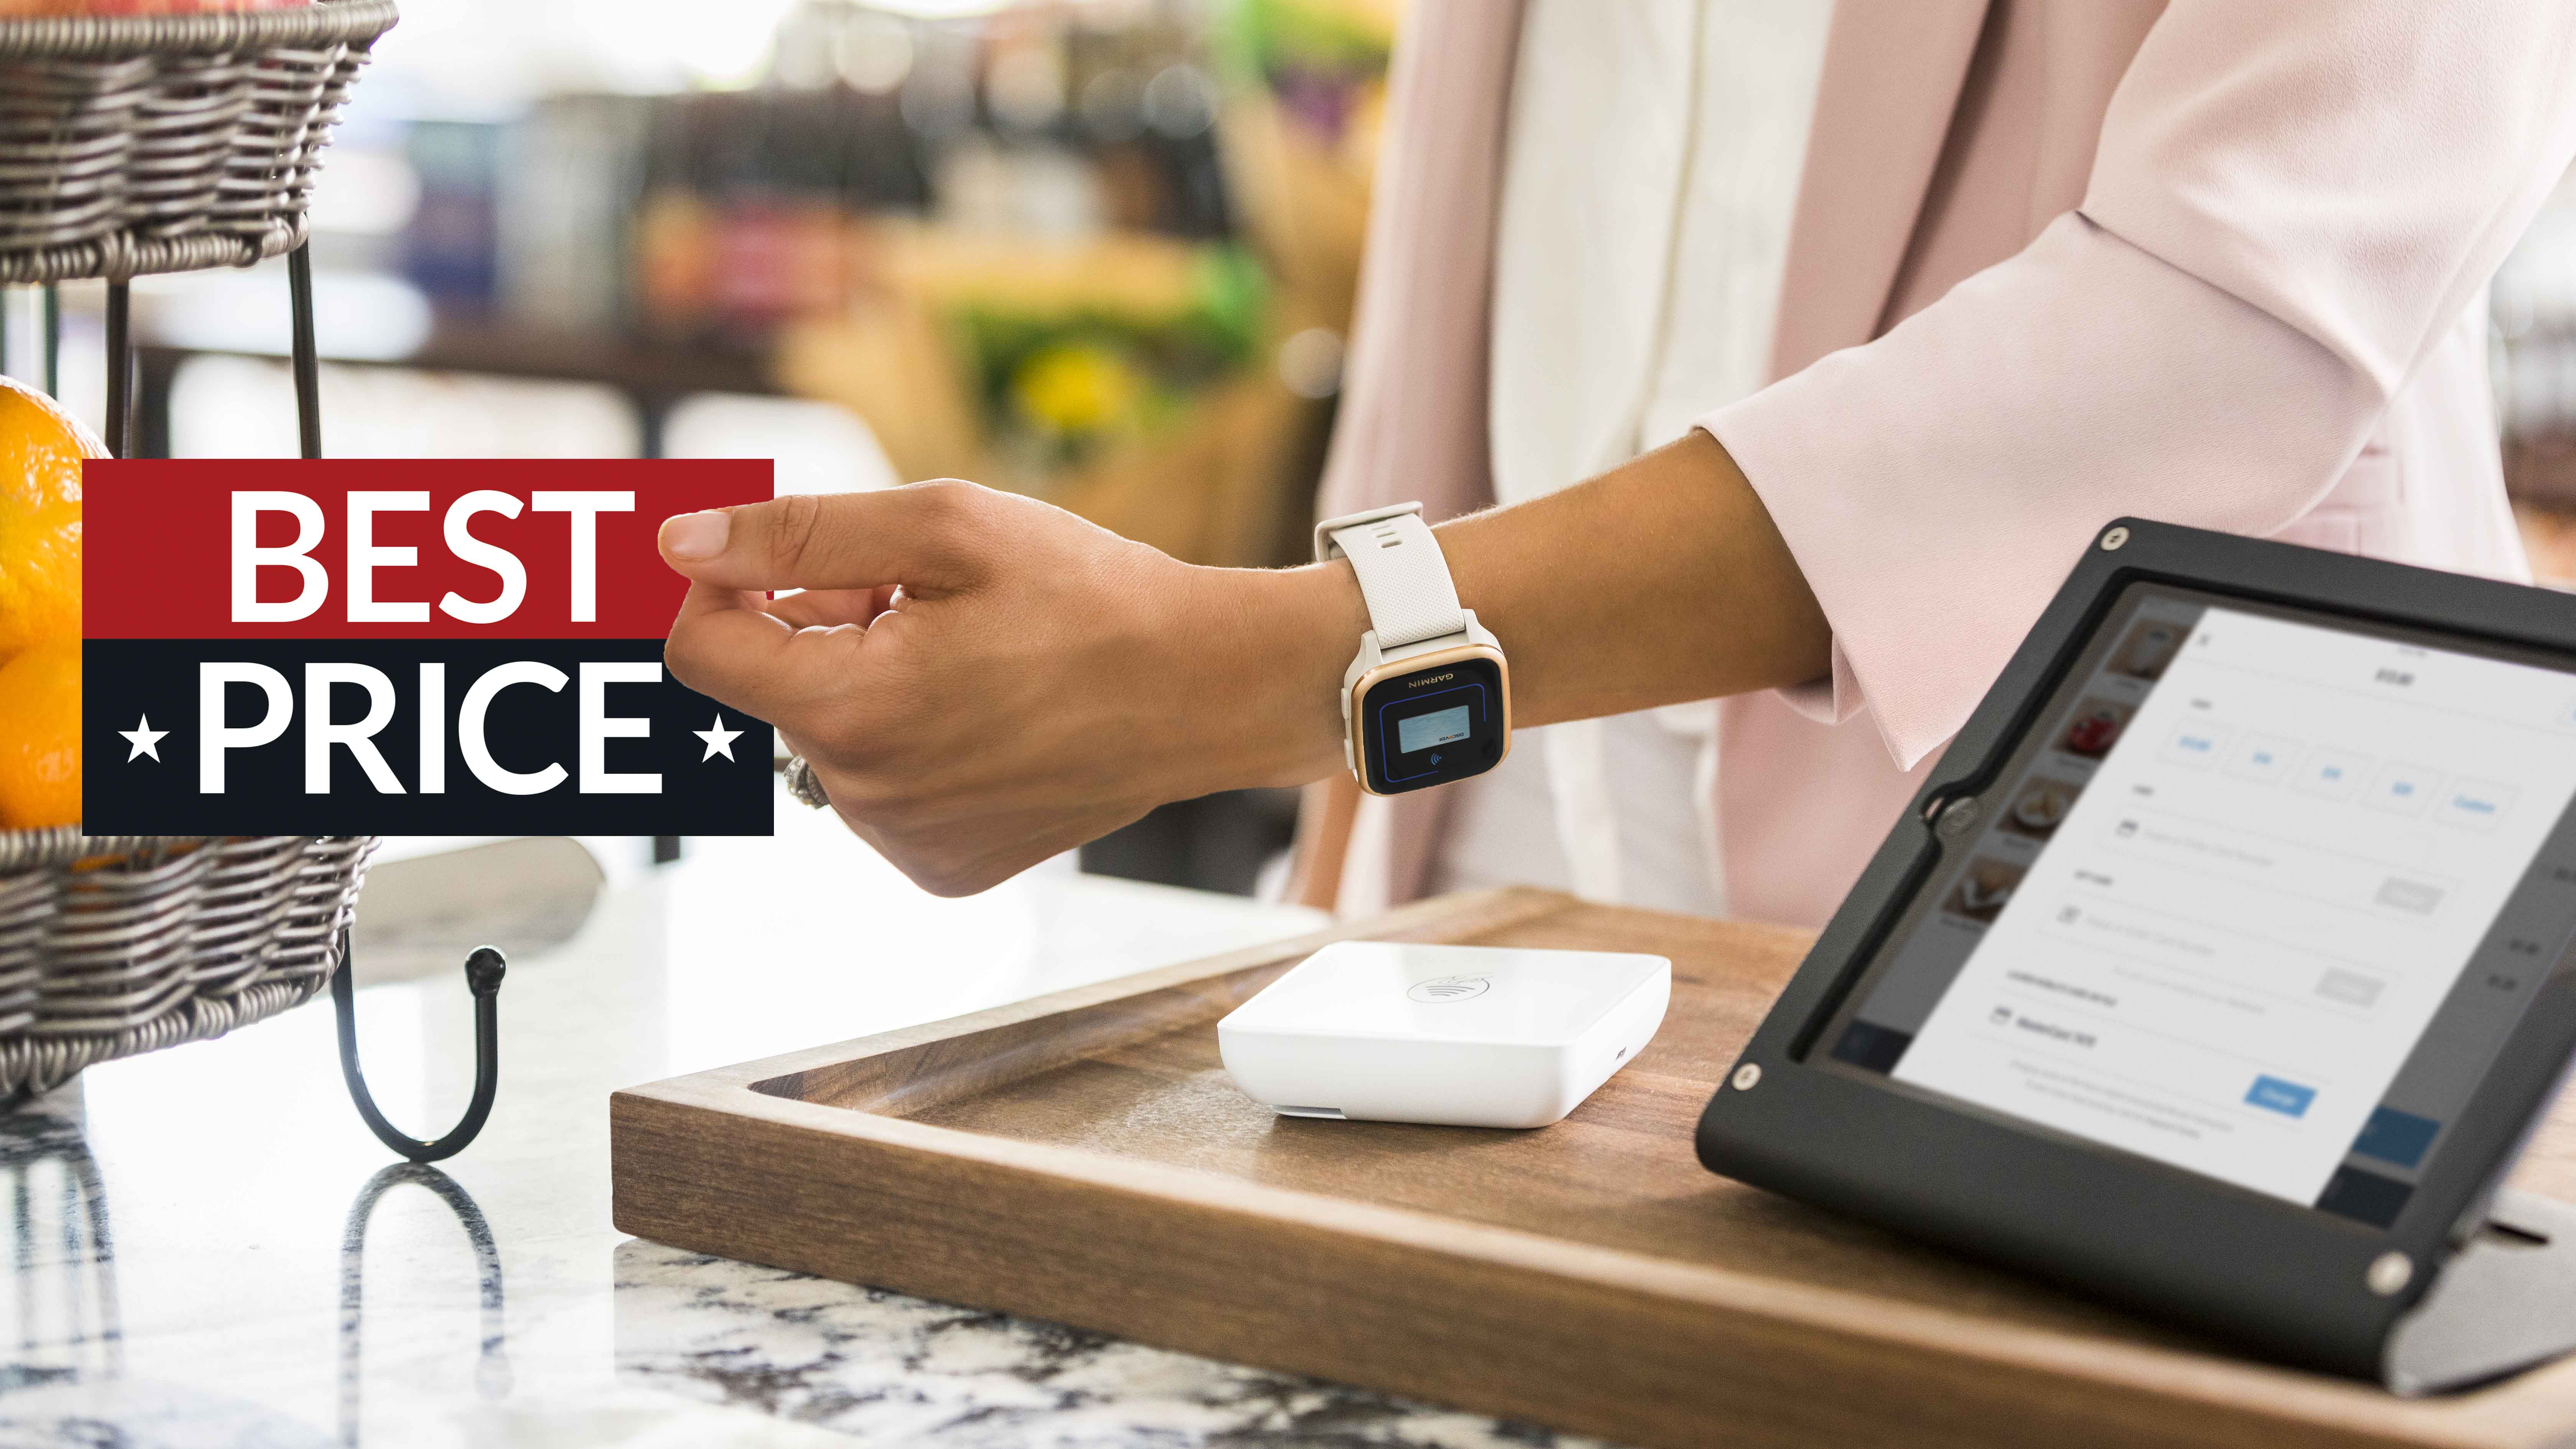 Best Garmin Deals For Black Friday 2020 The Best Cheap Garmin Running Watch And Fitness Watch Deals From Forerunner To Fenix T3